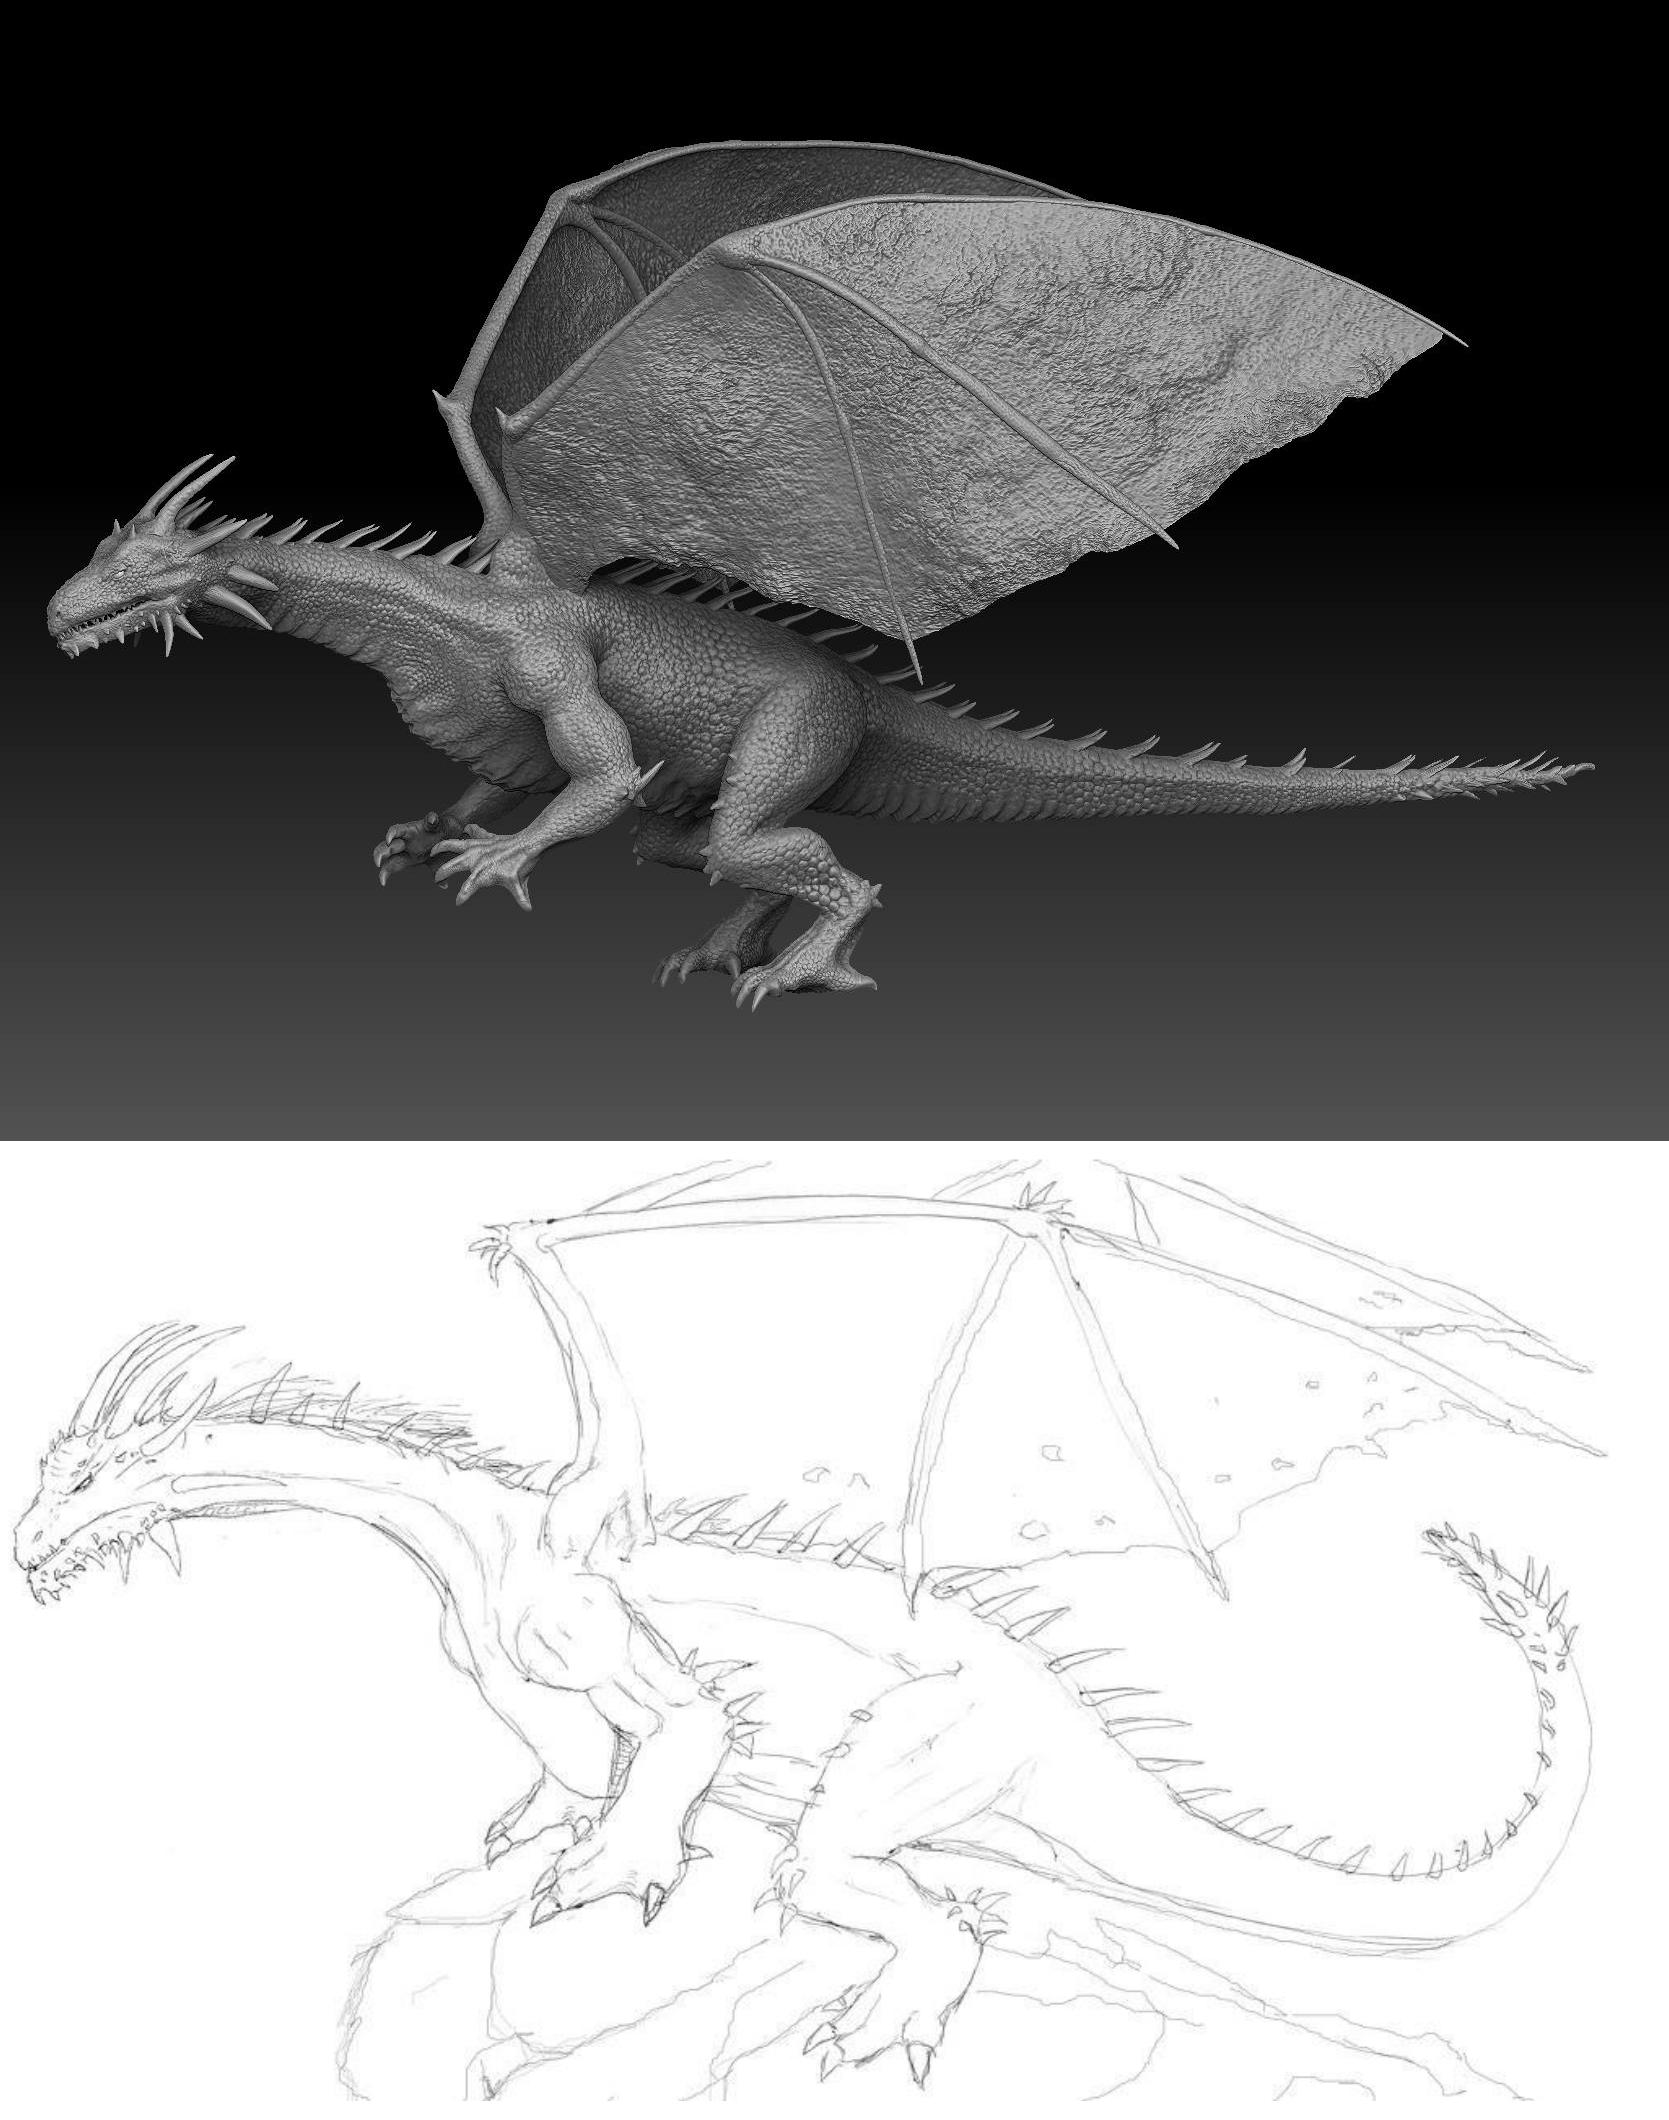 Dragon update concept to 3d model by rich35211 on deviantart for Deviantart 3d models